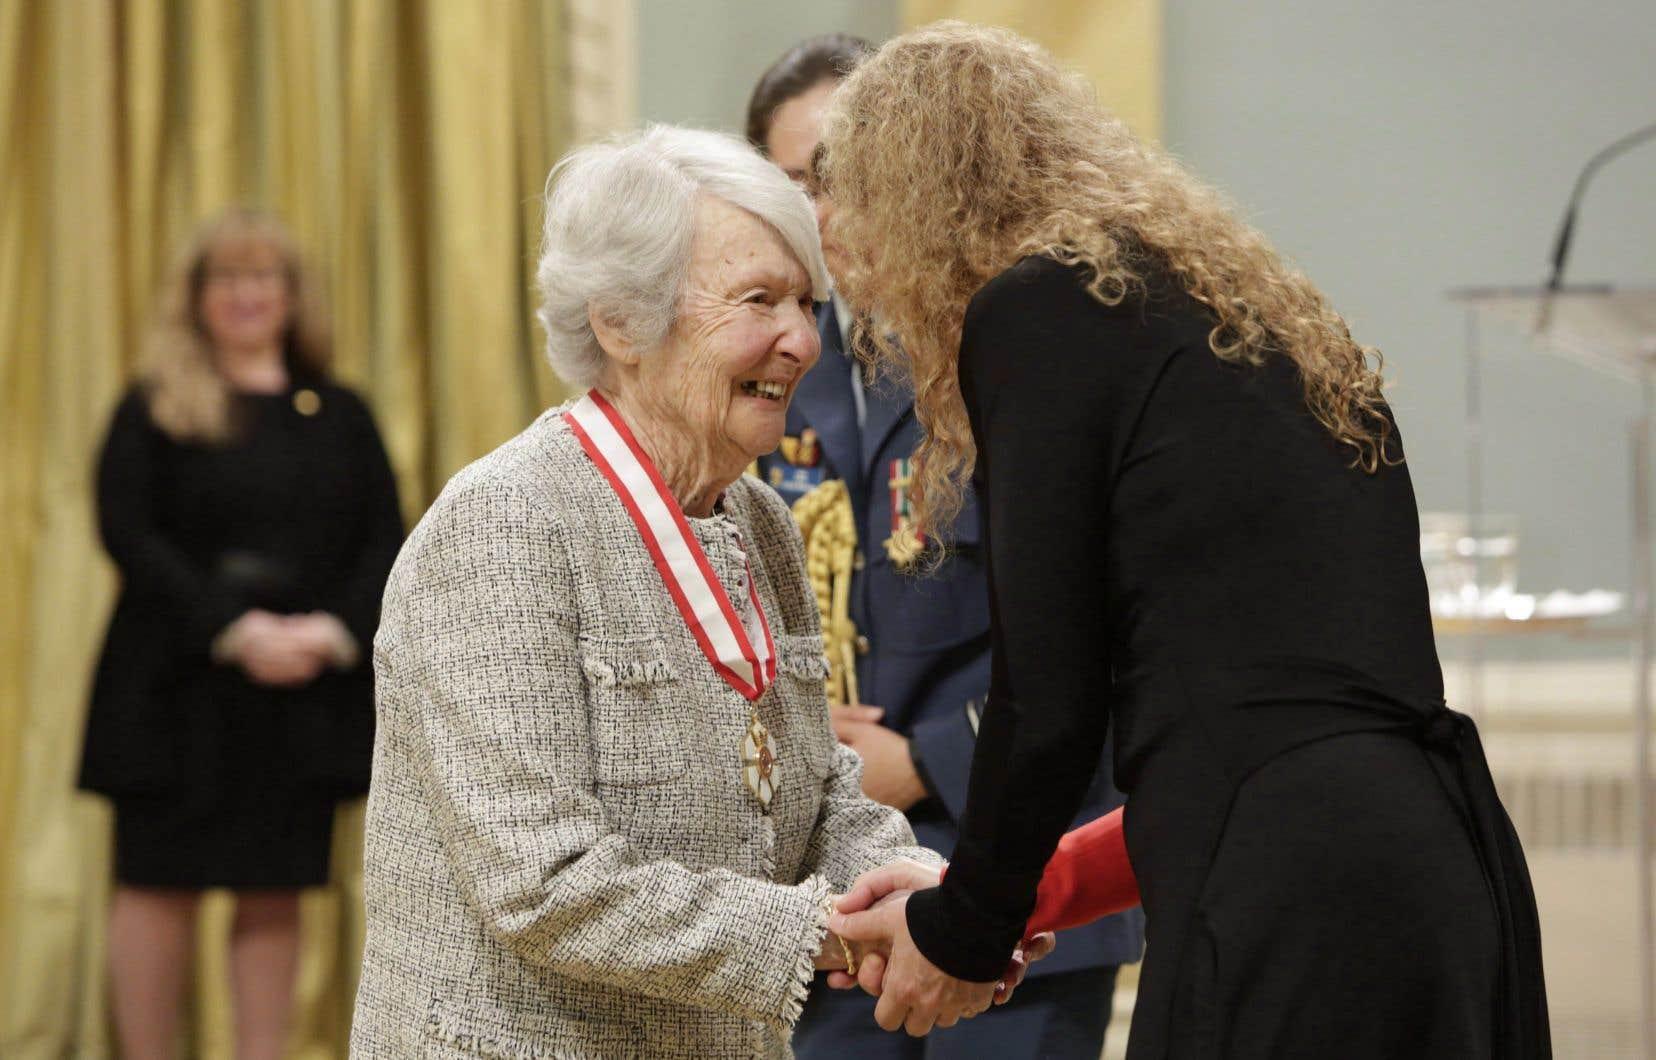 Cornelia Hahn Oberlander recevant l'insigne de Compagnon de l'Ordre du Canada, en 2018